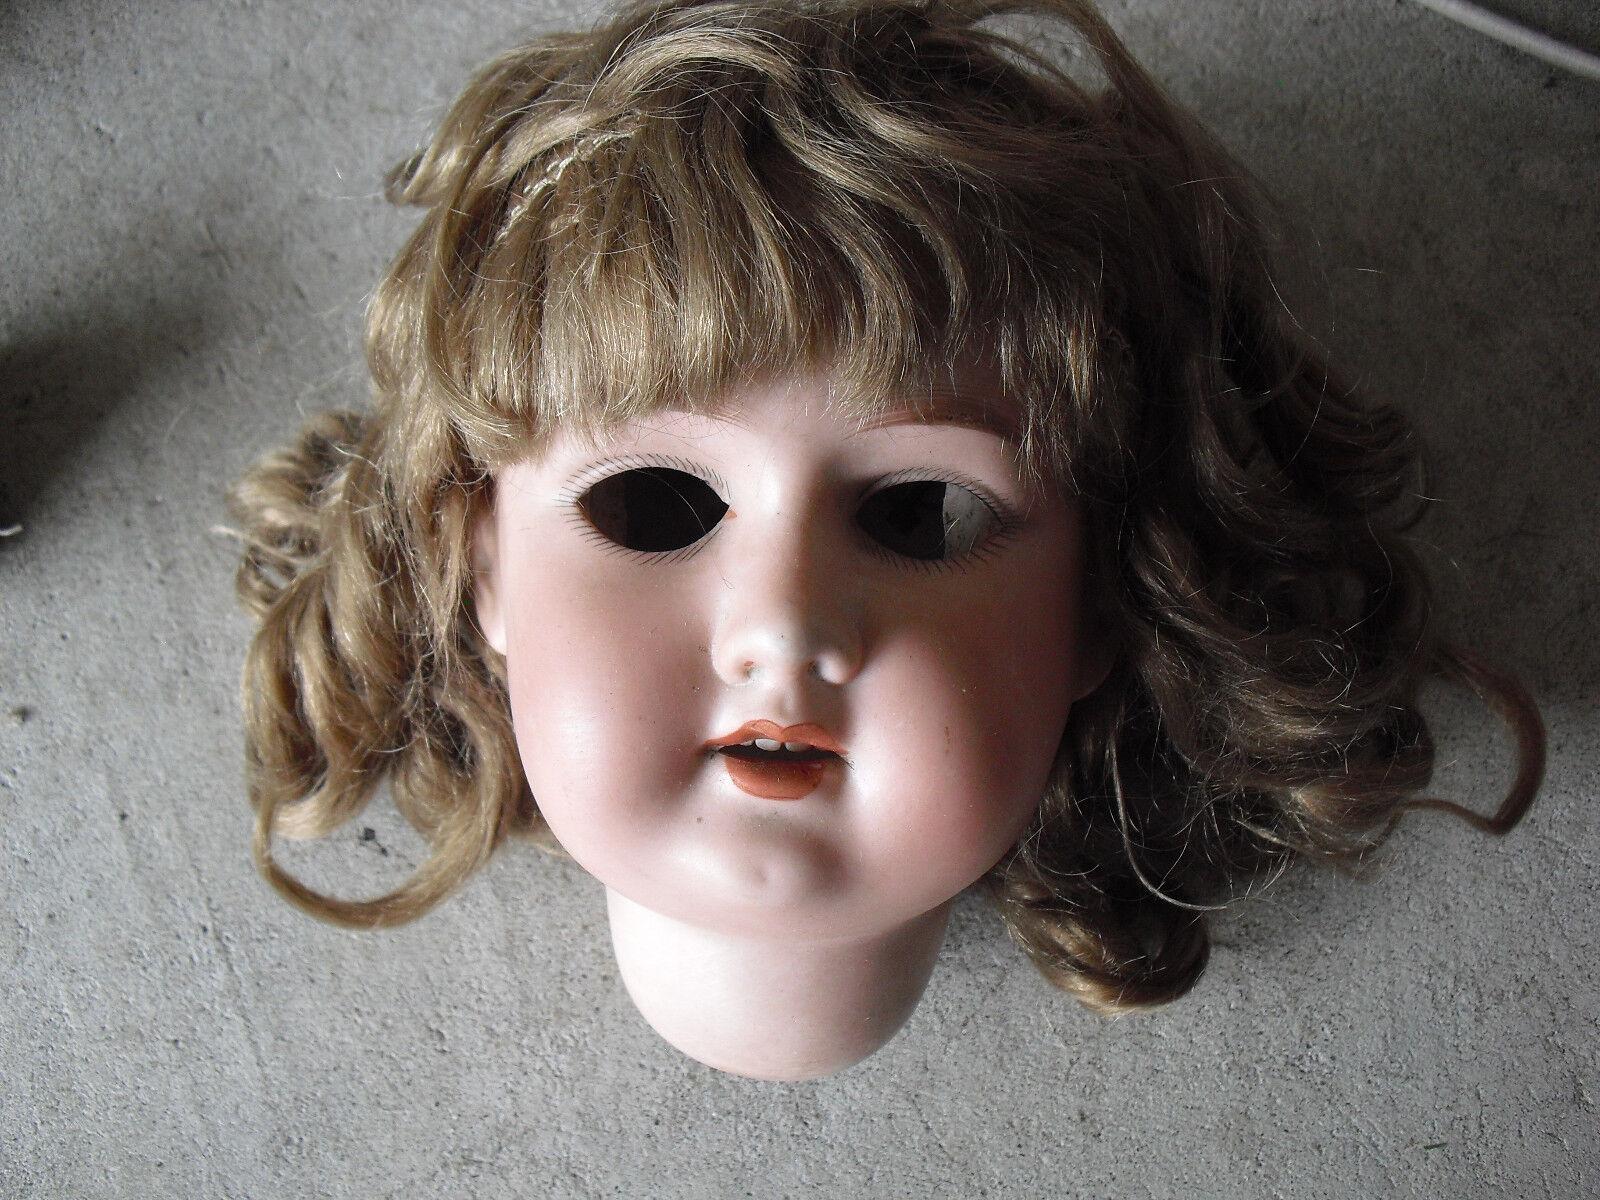 Vintage Geruomoy Aruomod Marseille Florodora A 8 M Bisque  Girl bambola Head 5 1 2  T  sconto di vendita